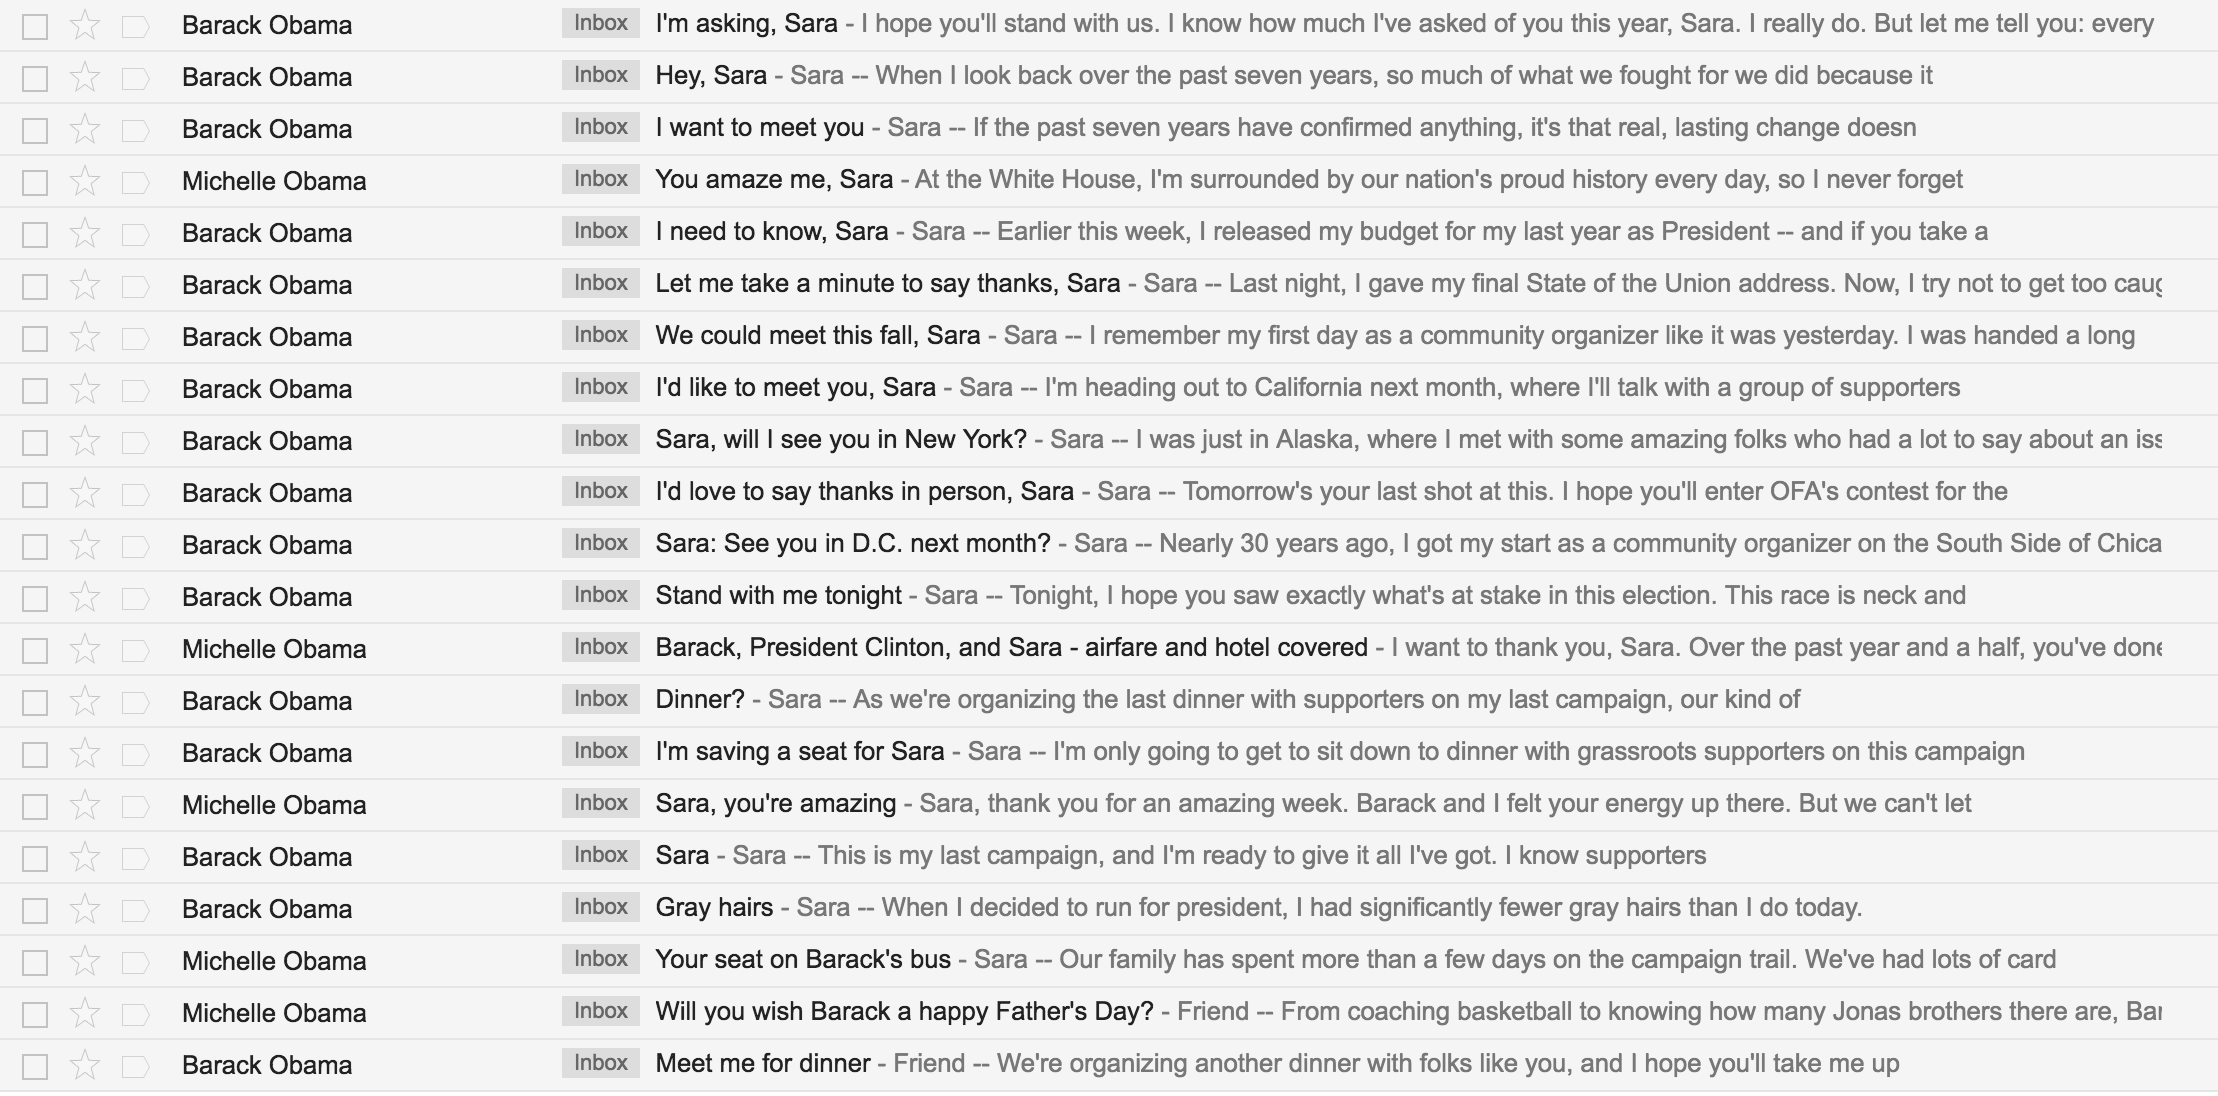 Inbox Screen Shot